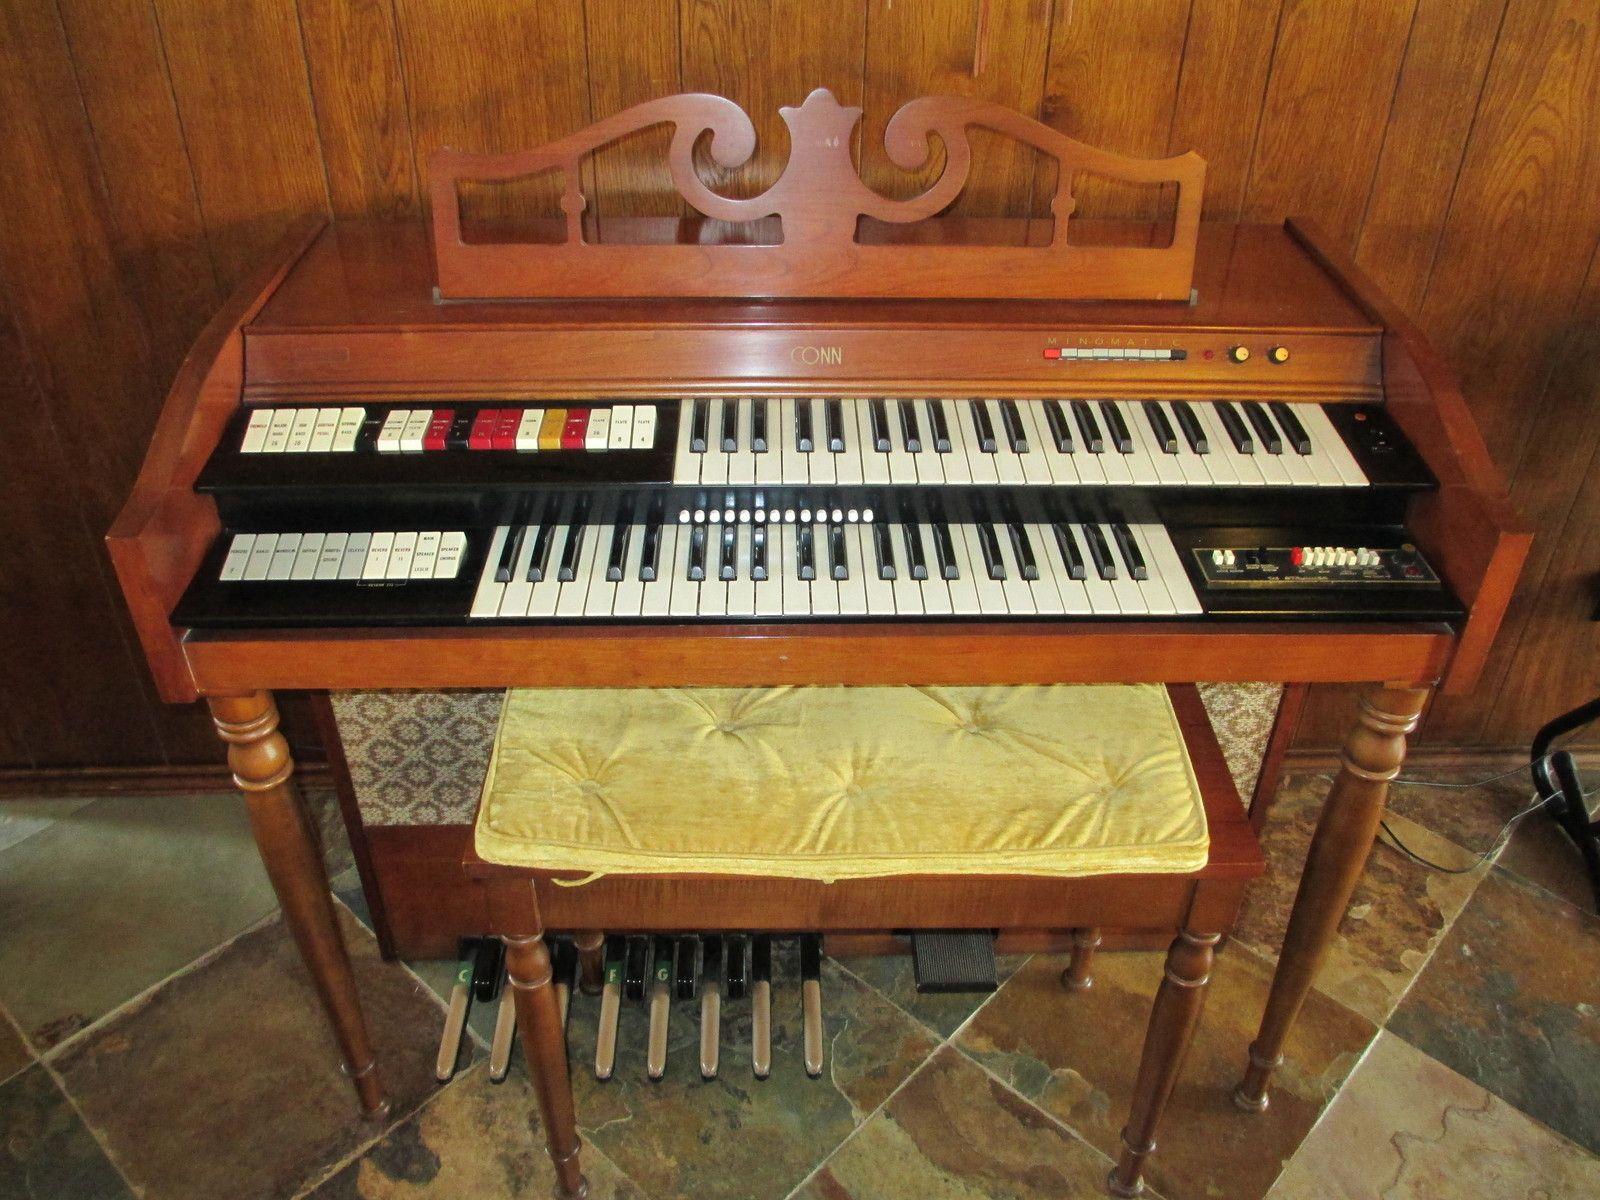 Conn Model 321 Prelude spinet organ.